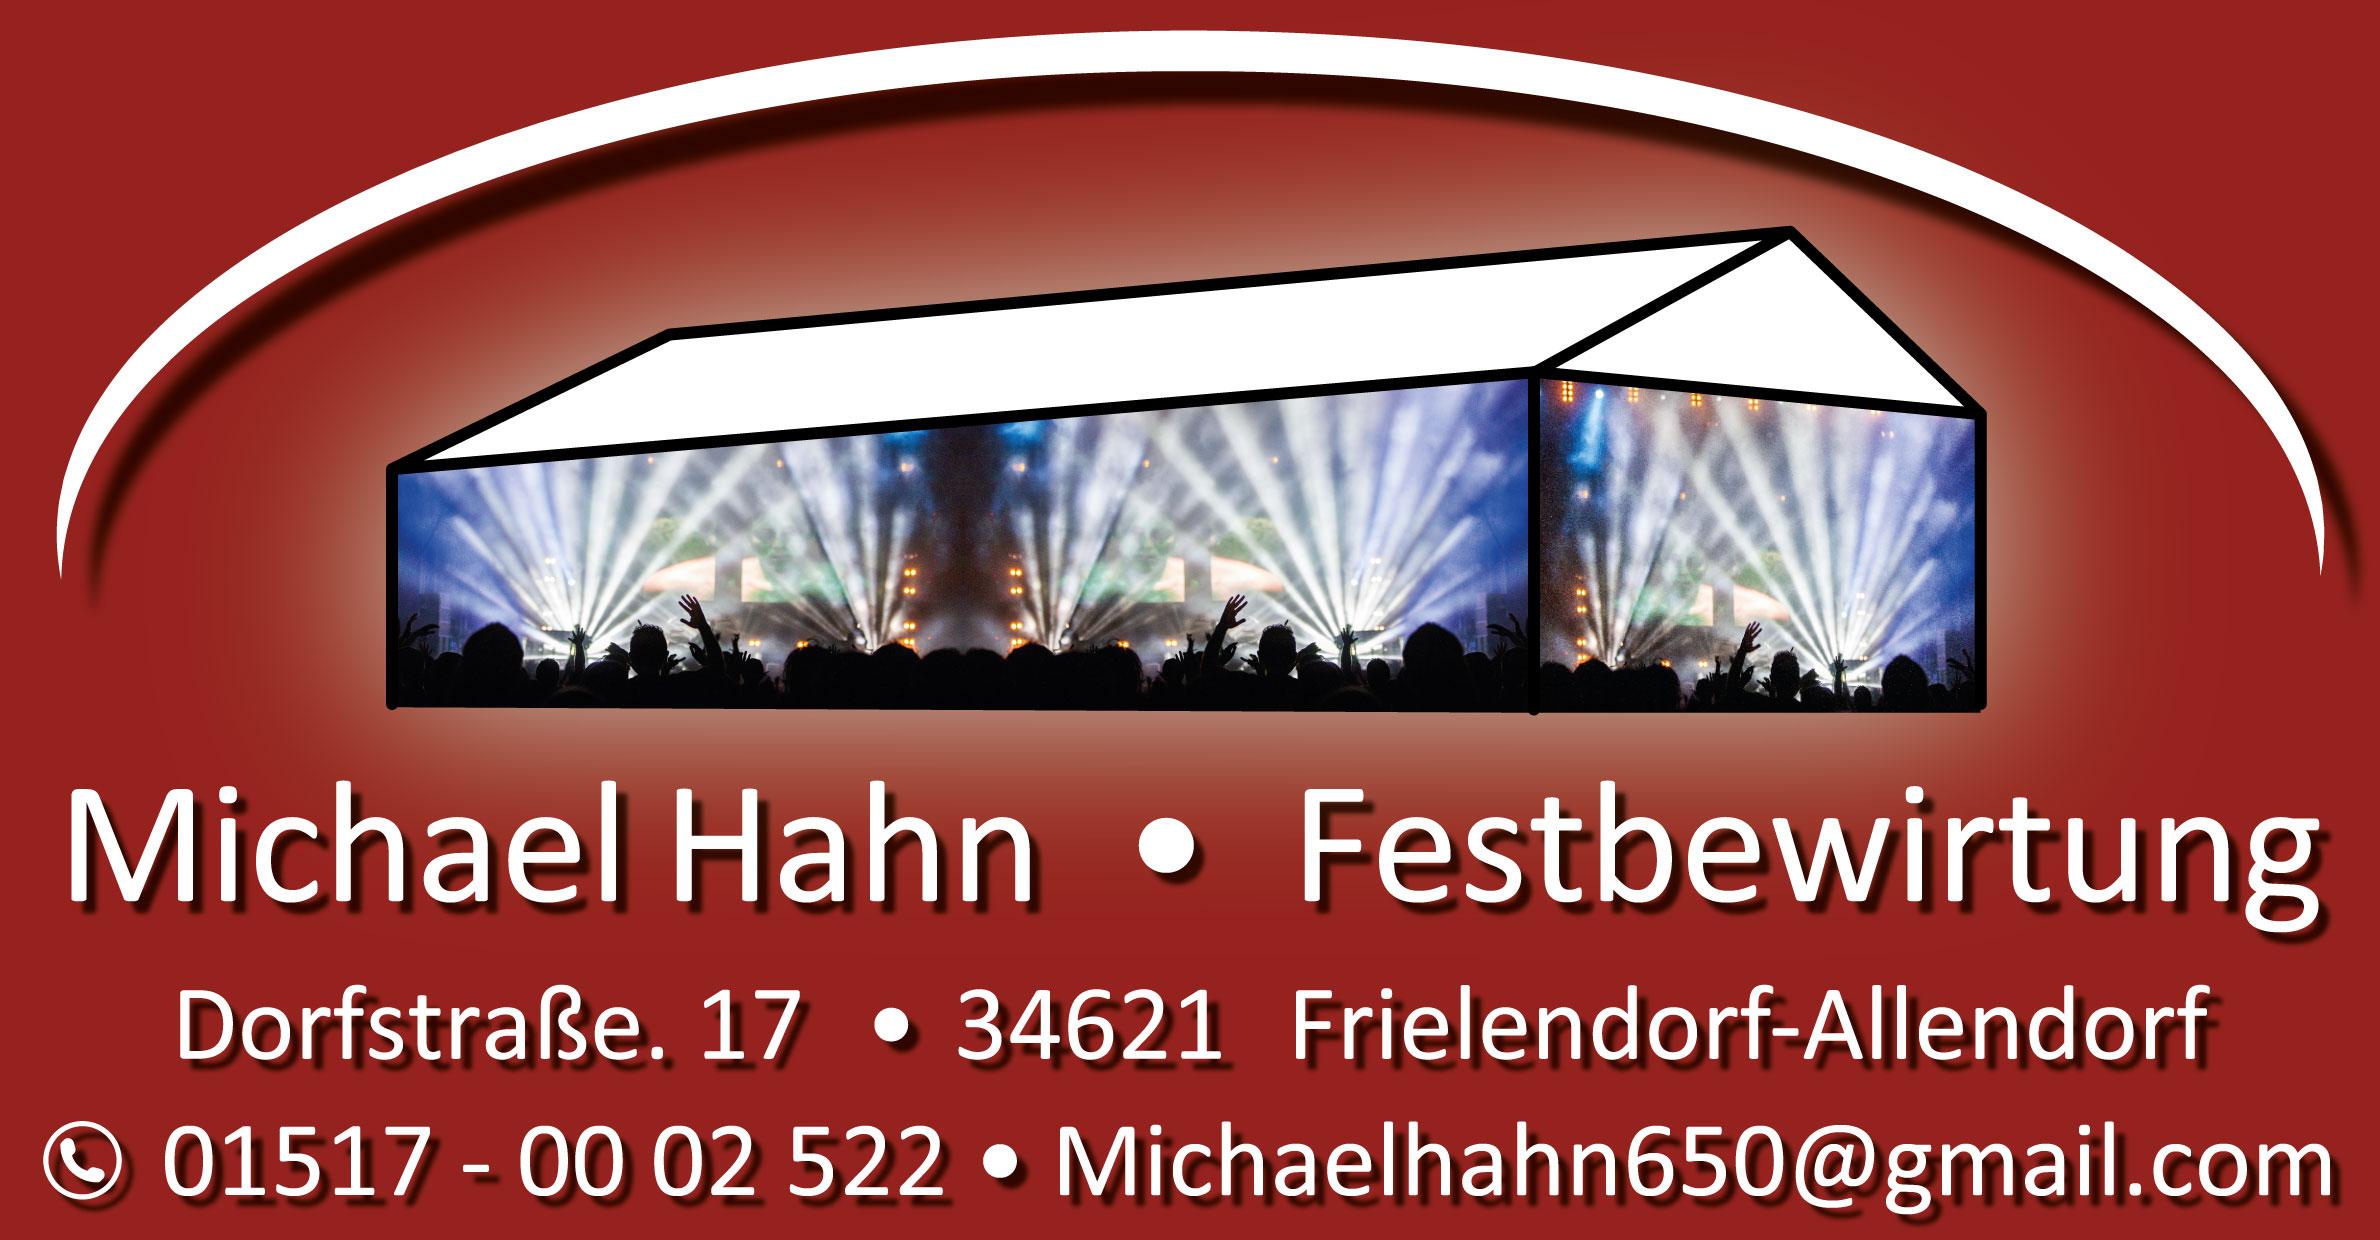 Michael Hahn-Festbewirtung